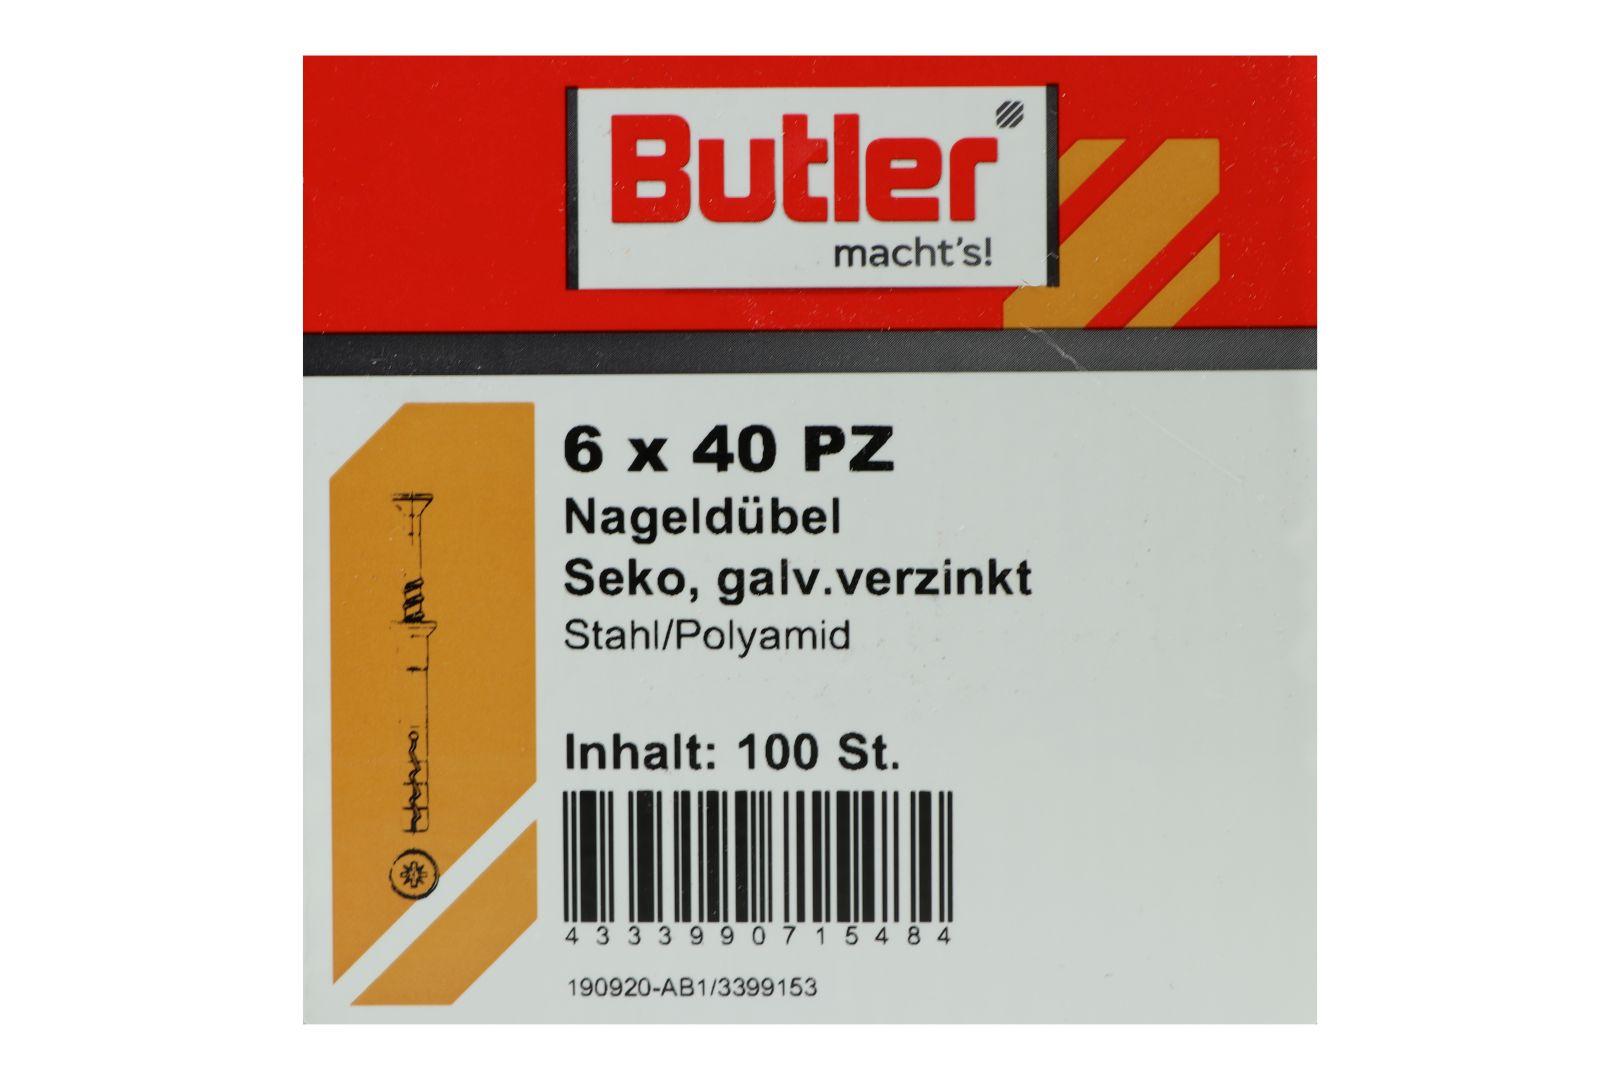 Butler macht's! Nageldübel, Stahl / Polyamid, Senkkopf, galvanisch verzinkt 6 x 40 mm, 100 Stück